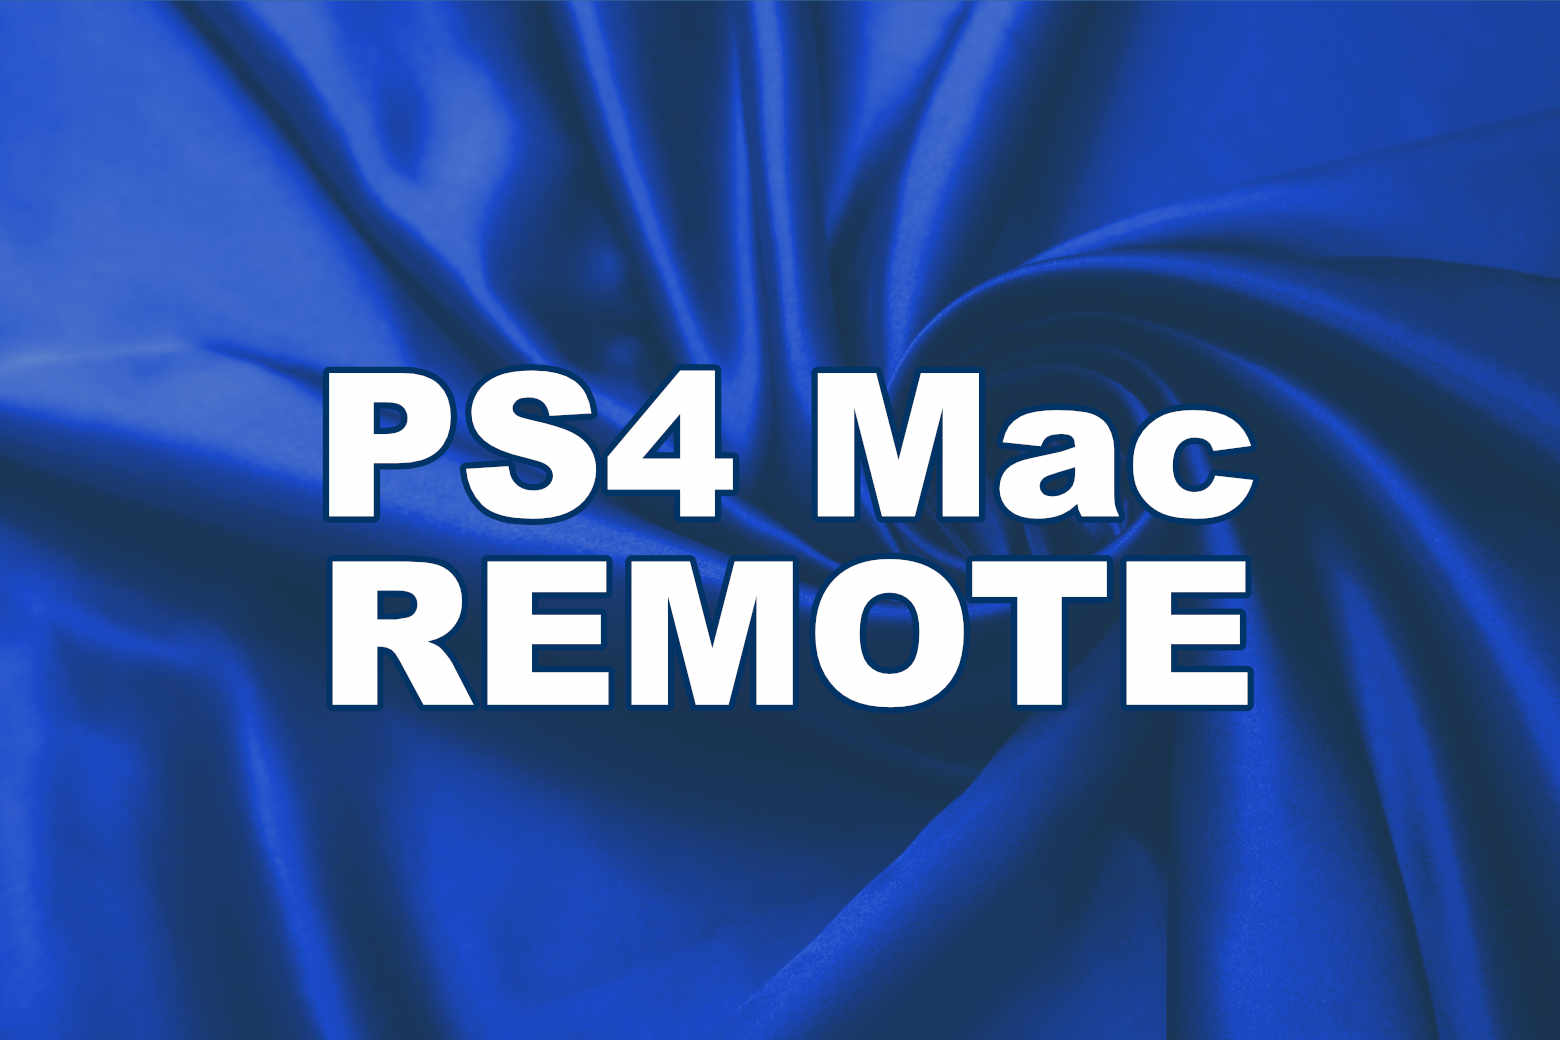 PlayStation4 Proのリモートプレイは最高1080pの解像度【PS4/Mac/レビュー】